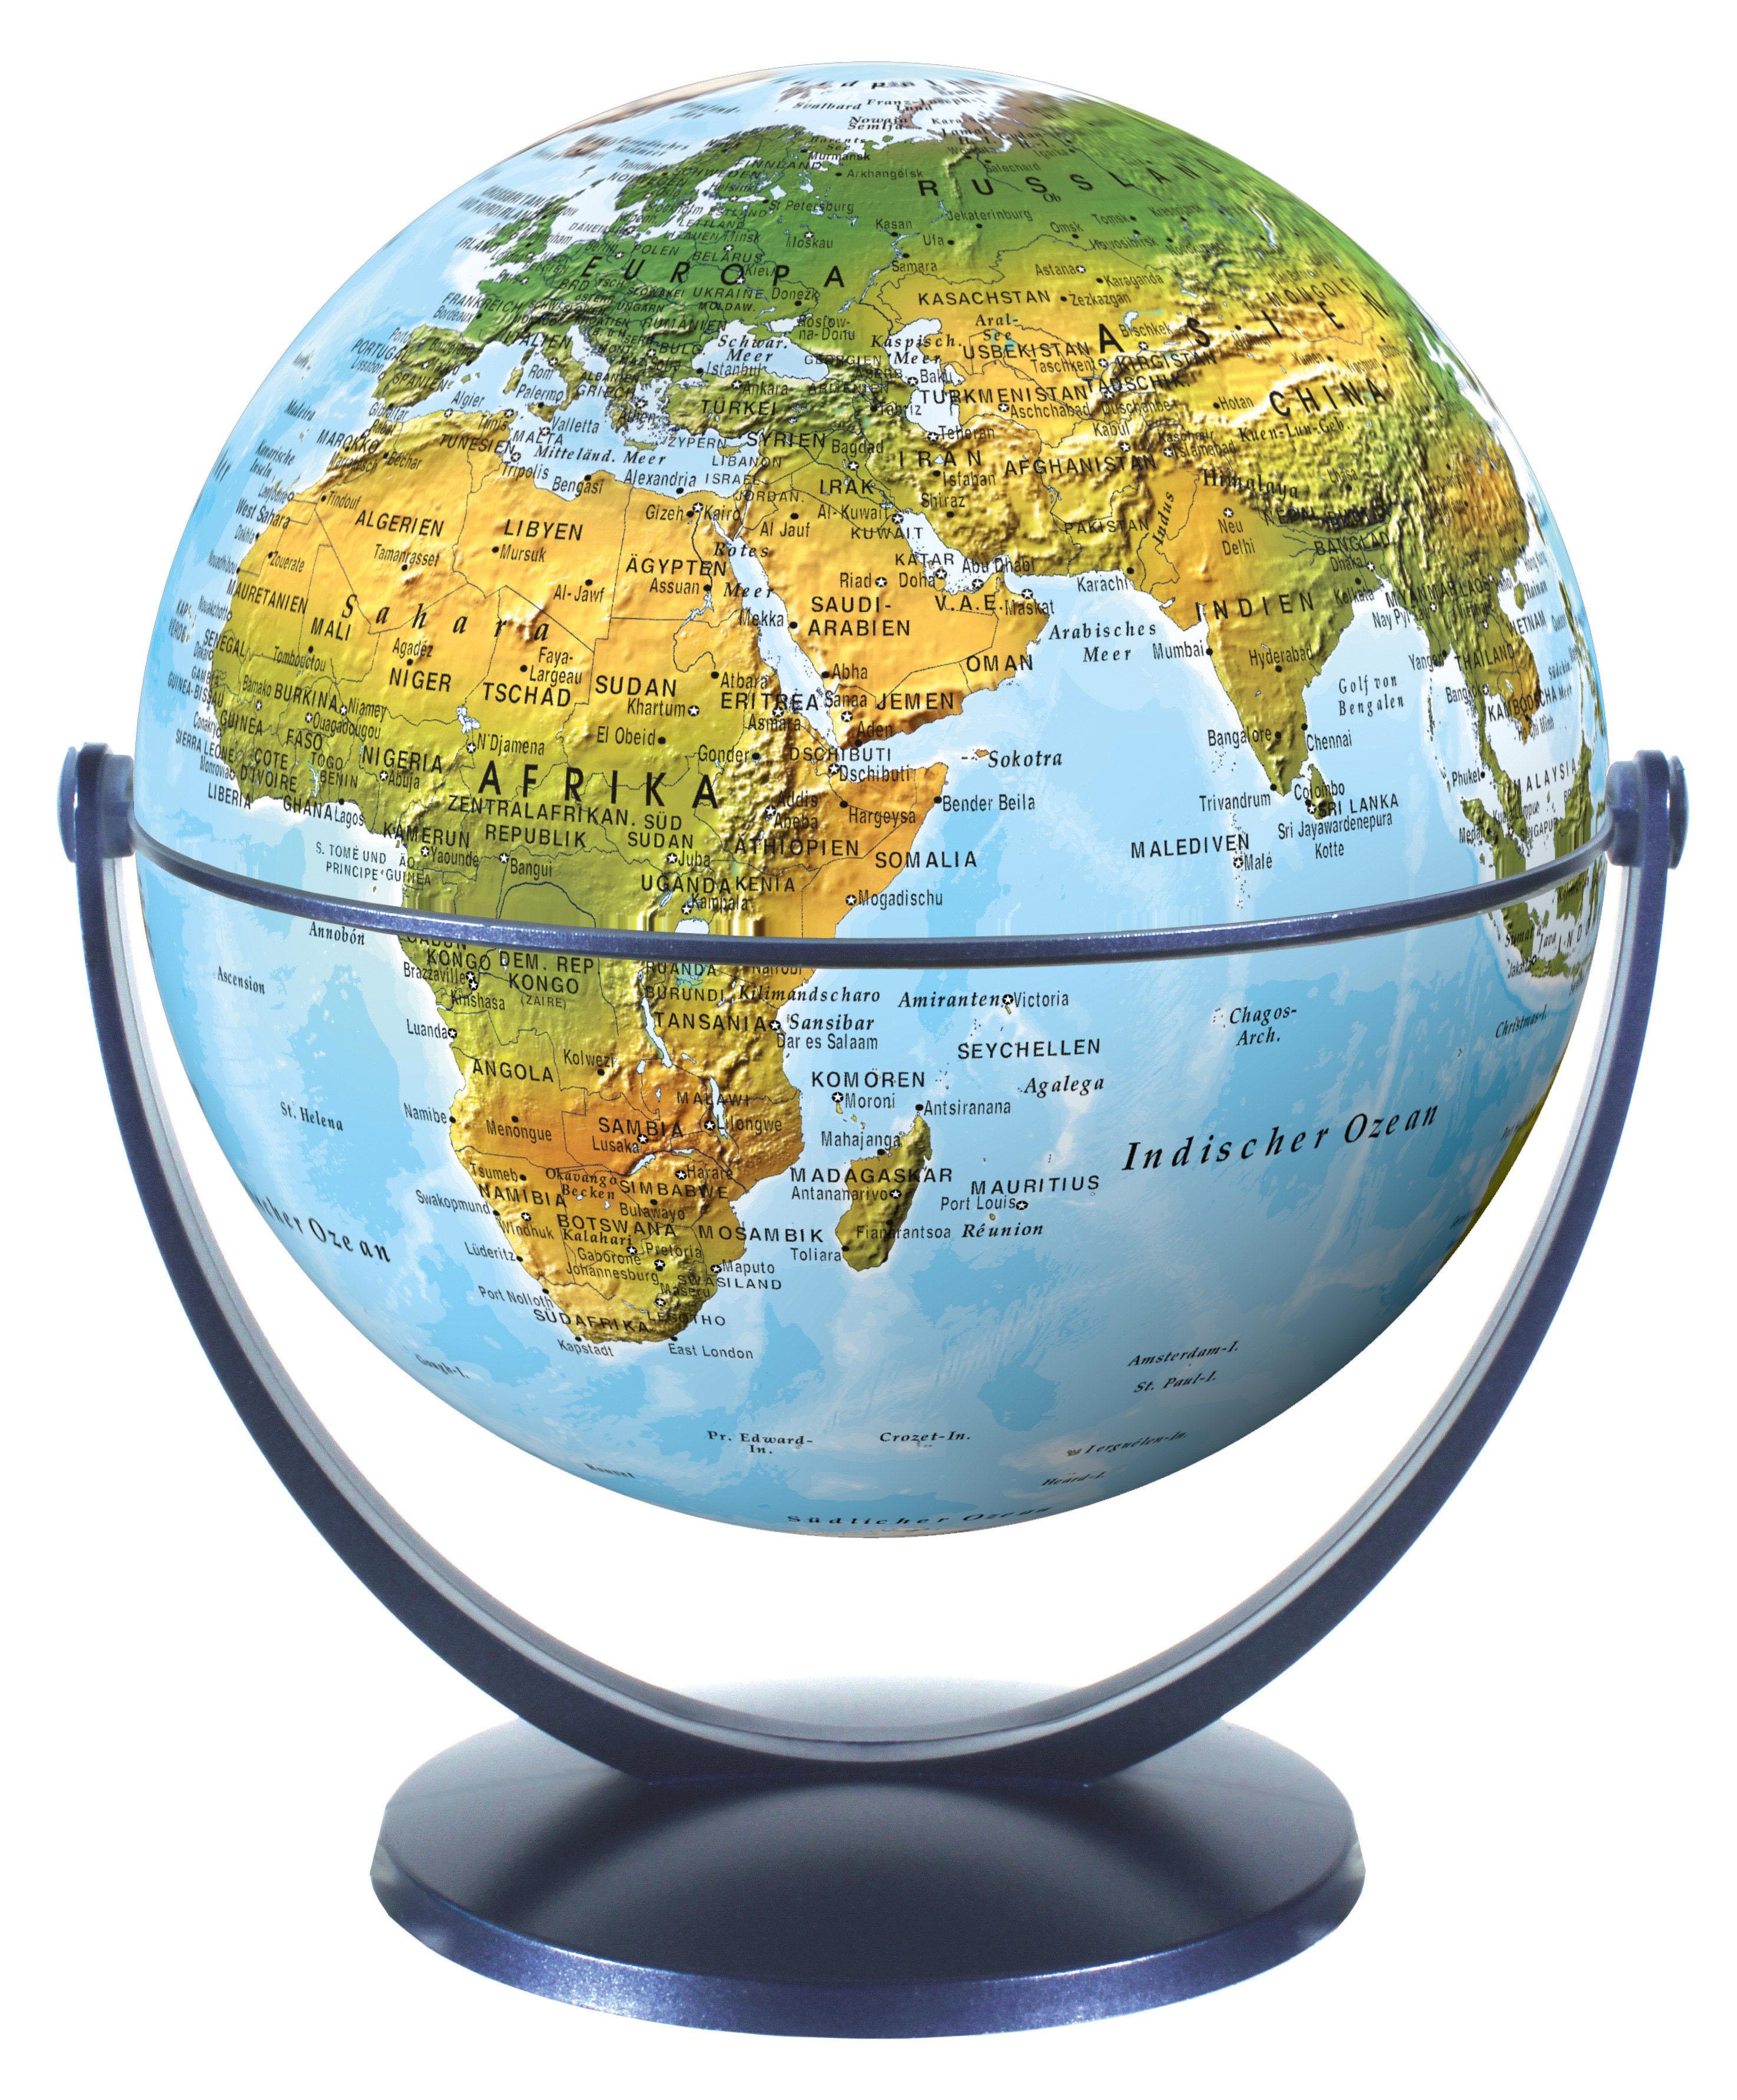 Draai & Kantelglobe 15 cm natuurkundig 4028465940125  Stellanova Globes / Wereldbollen  Globes Wereld als geheel